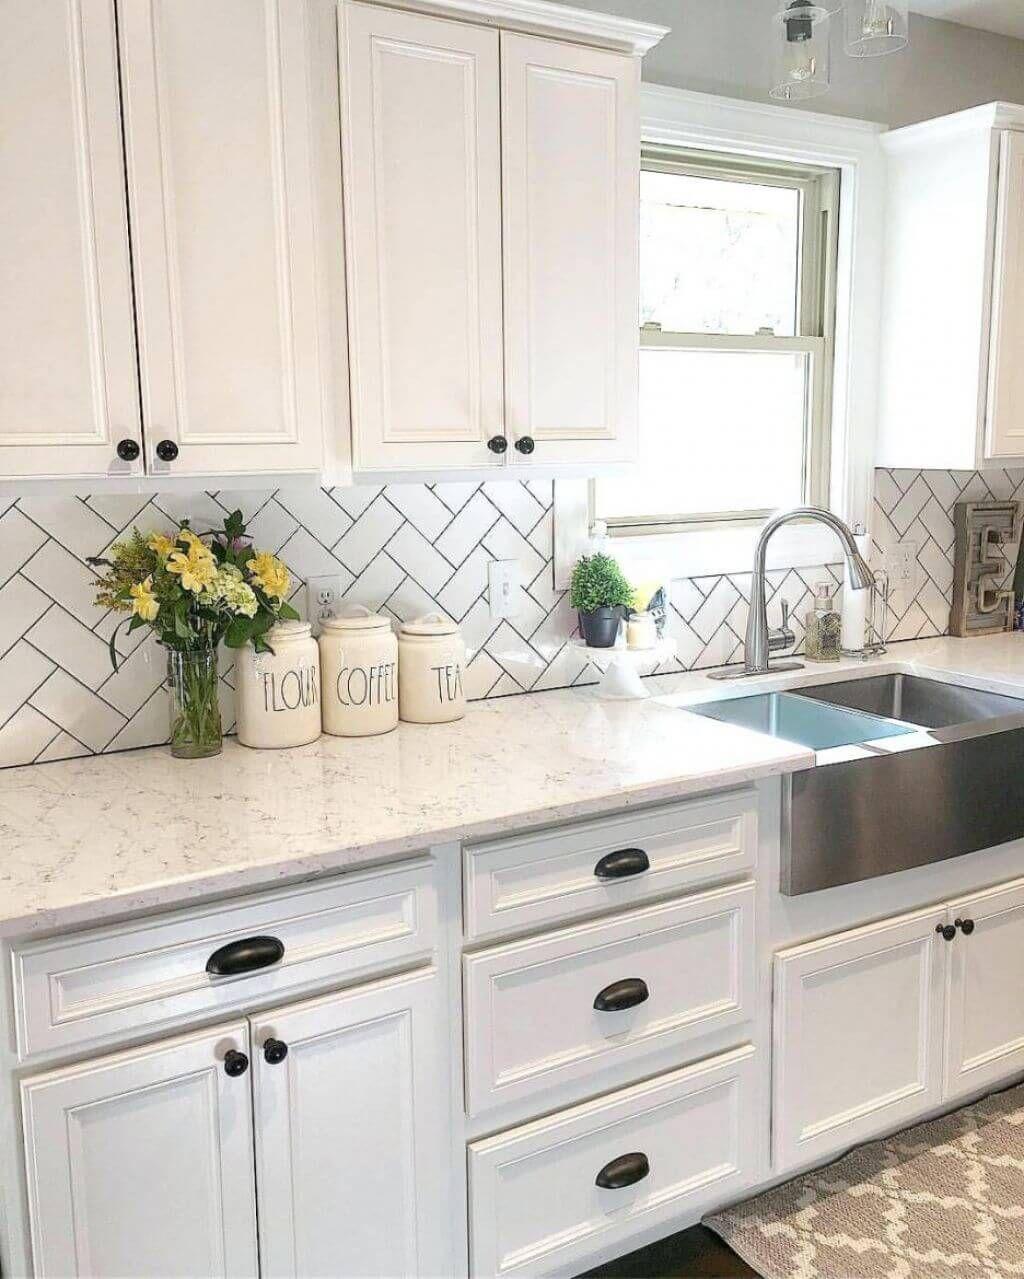 10 Black And White Kitchen Backsplash Ideas 2020 The Tips